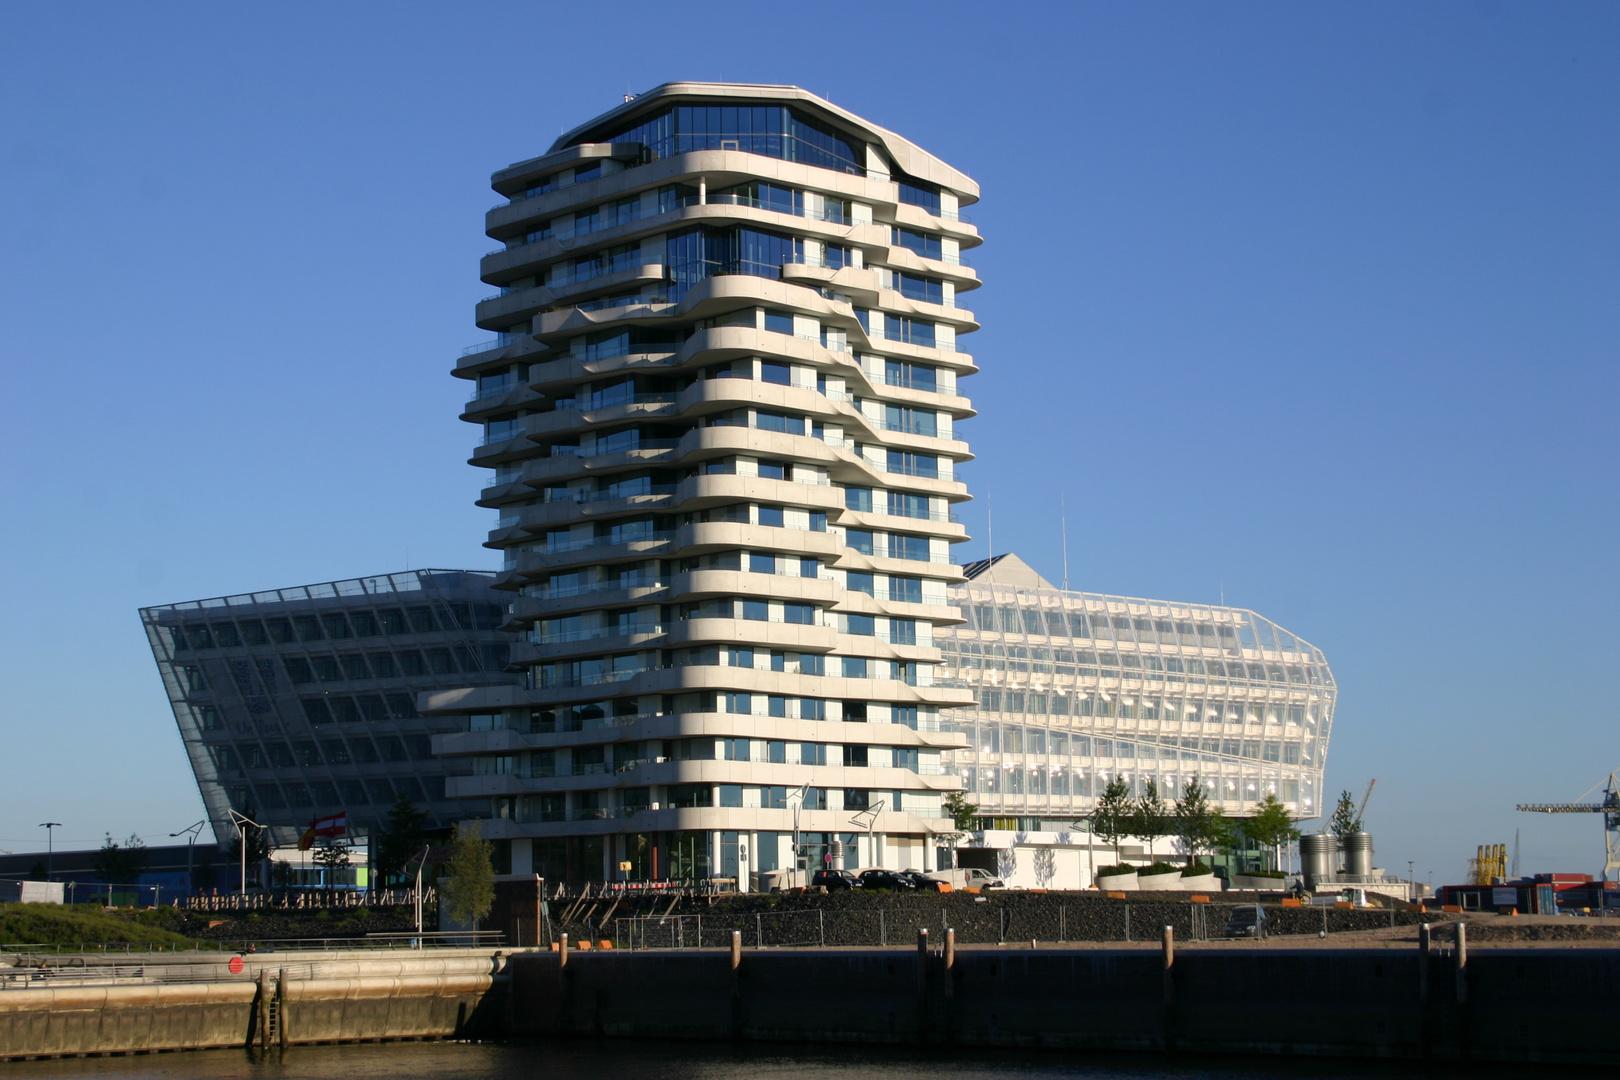 Marco Polo Tower Foto & Bild | architektur, profanbauten, youth ...